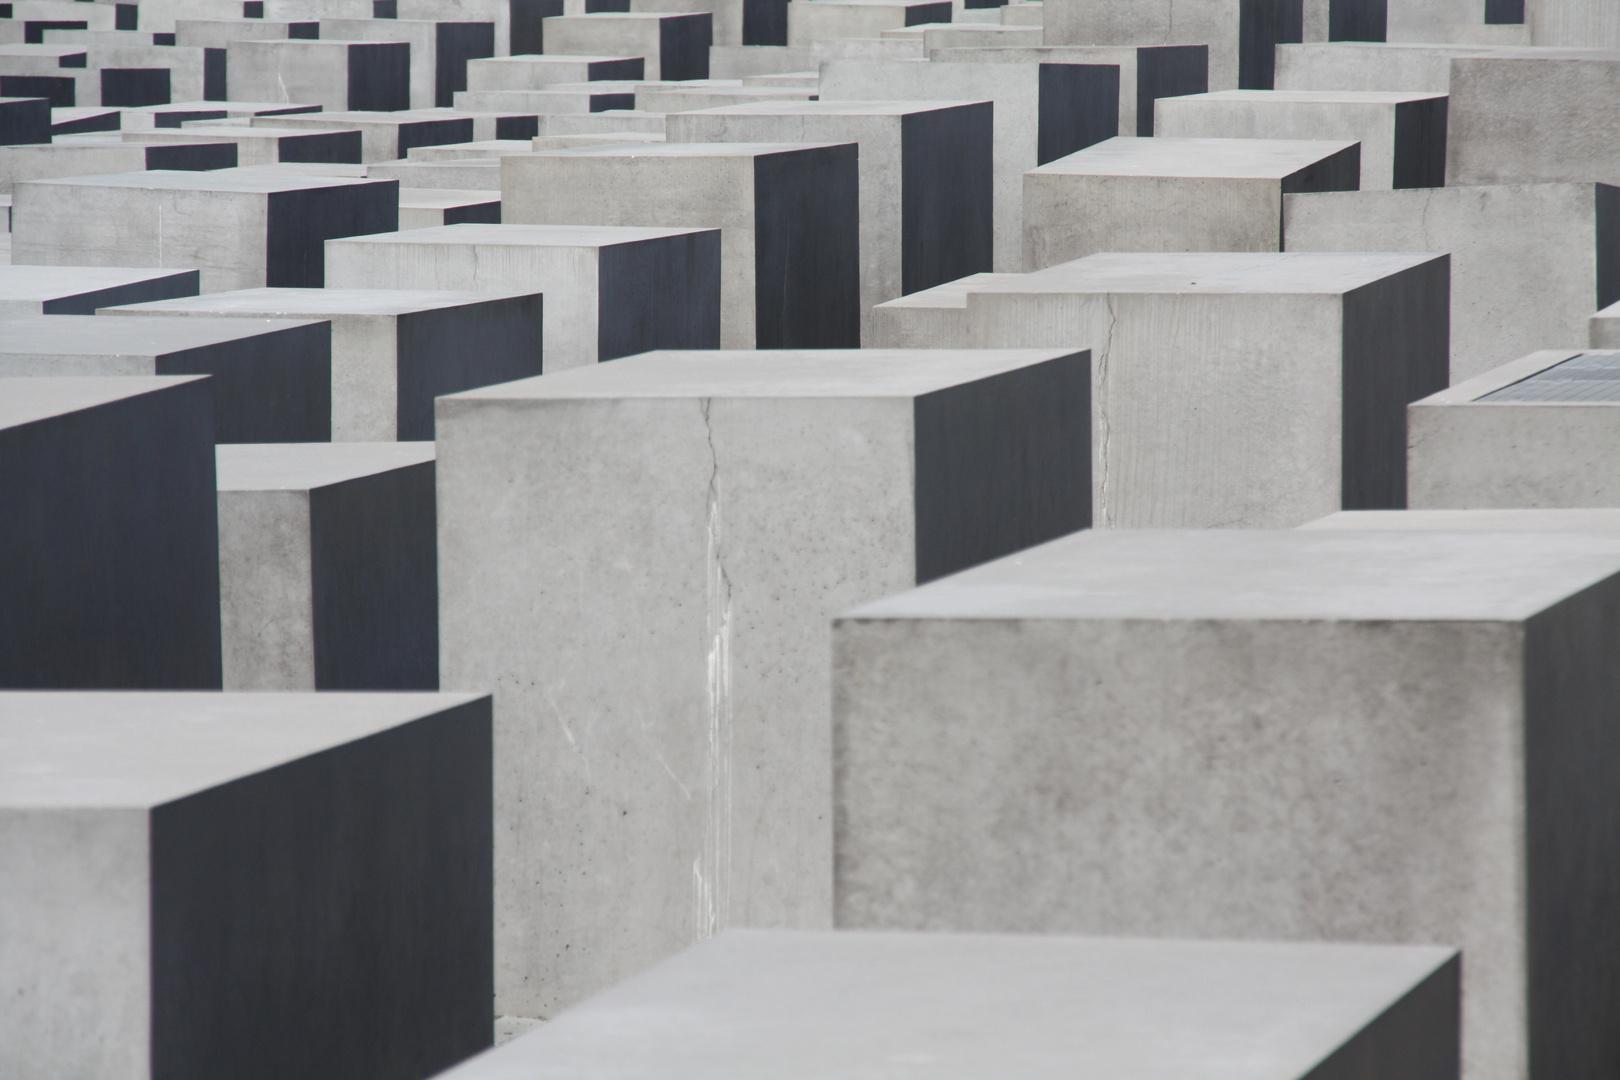 Holocaust-Mahnmahl in Berlin